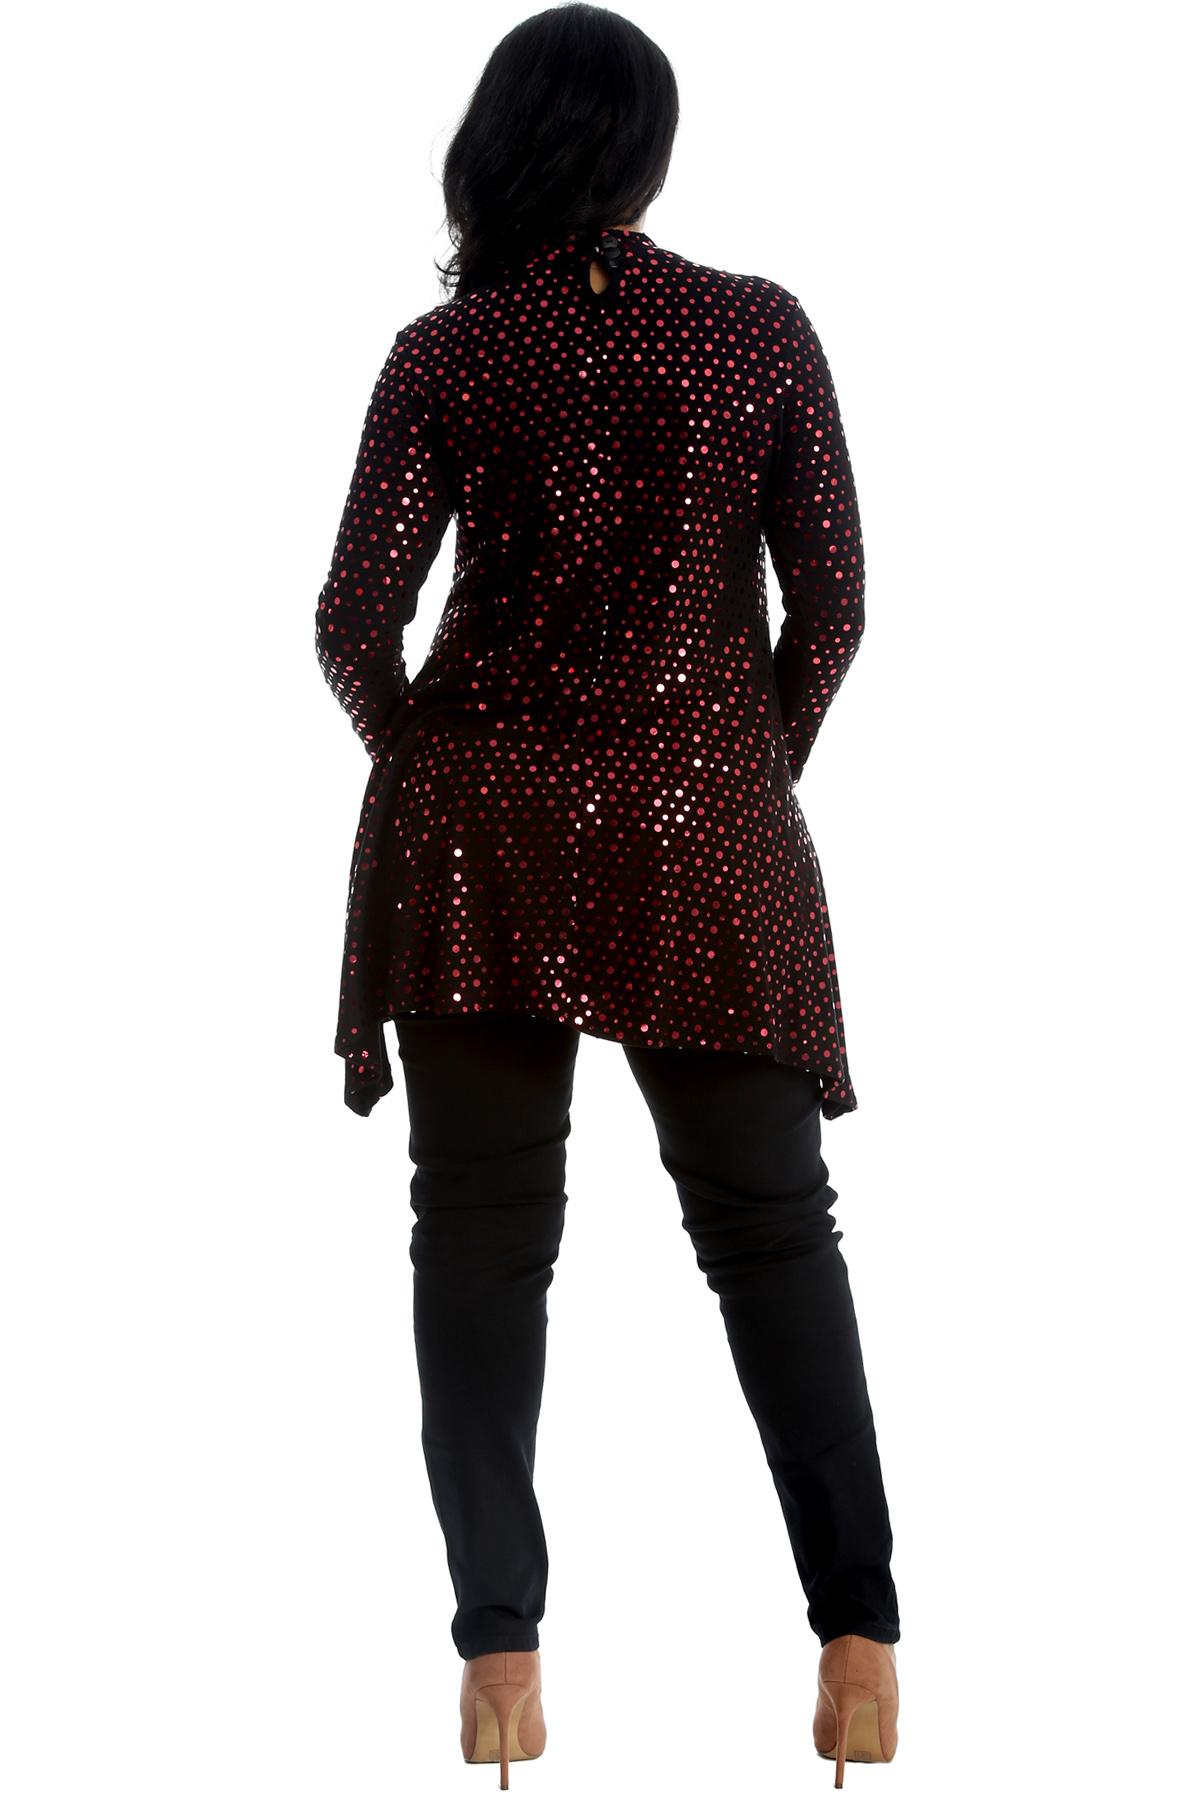 New Womens Top Plus Size Swing Style Ladies Polka Dot Foil Tunic Choker Neck